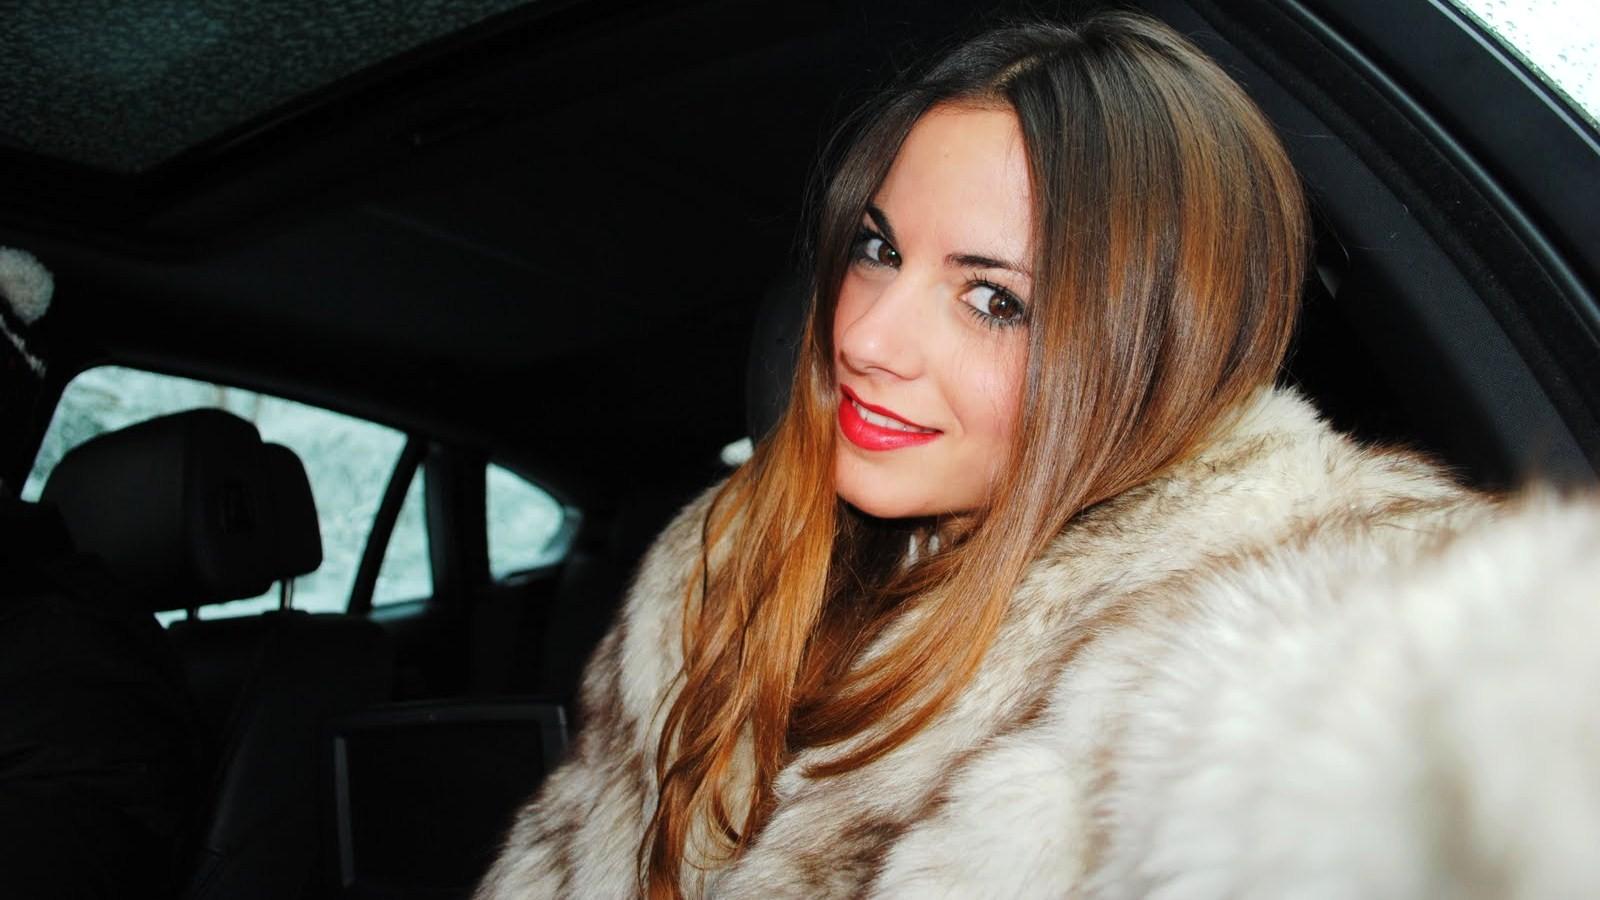 http://2.bp.blogspot.com/-kZU5Uq6bwoQ/TecBbGrf2VI/AAAAAAAAEq0/847ug7d5FrU/s1600/red+lipstick+and+fur.JPG